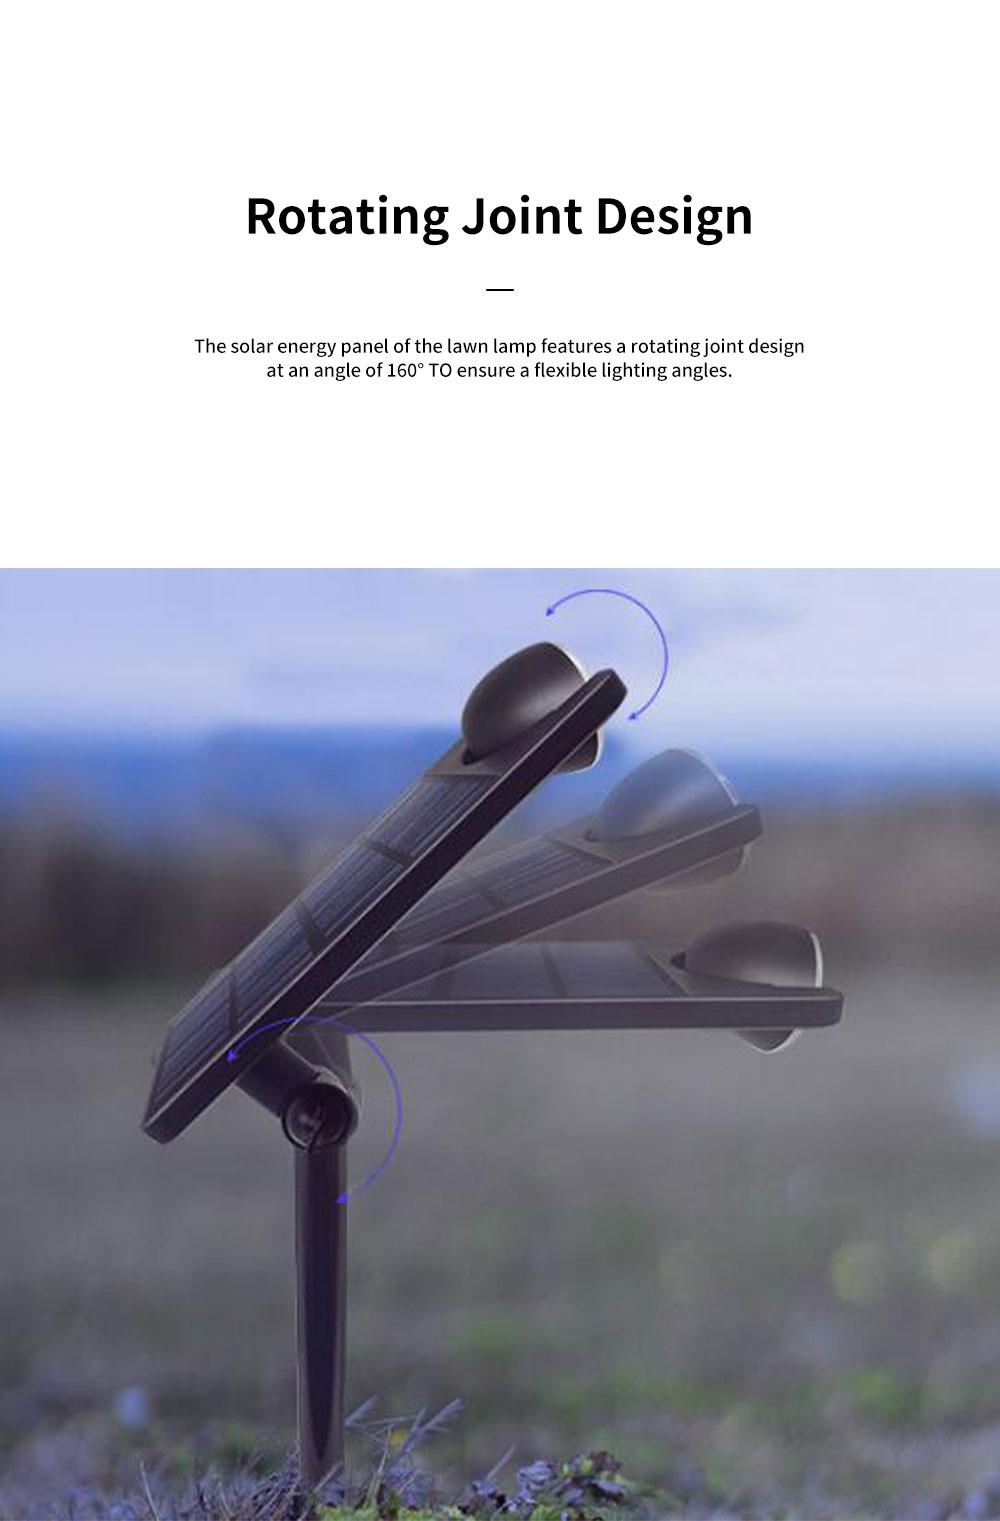 Solar Energy Ultra Thin Wall Lamp for Lawn Lighting Decoration Body Sensing Flat Panel Lawn Light Ultrathin Waterproof Lawn Lamp 6